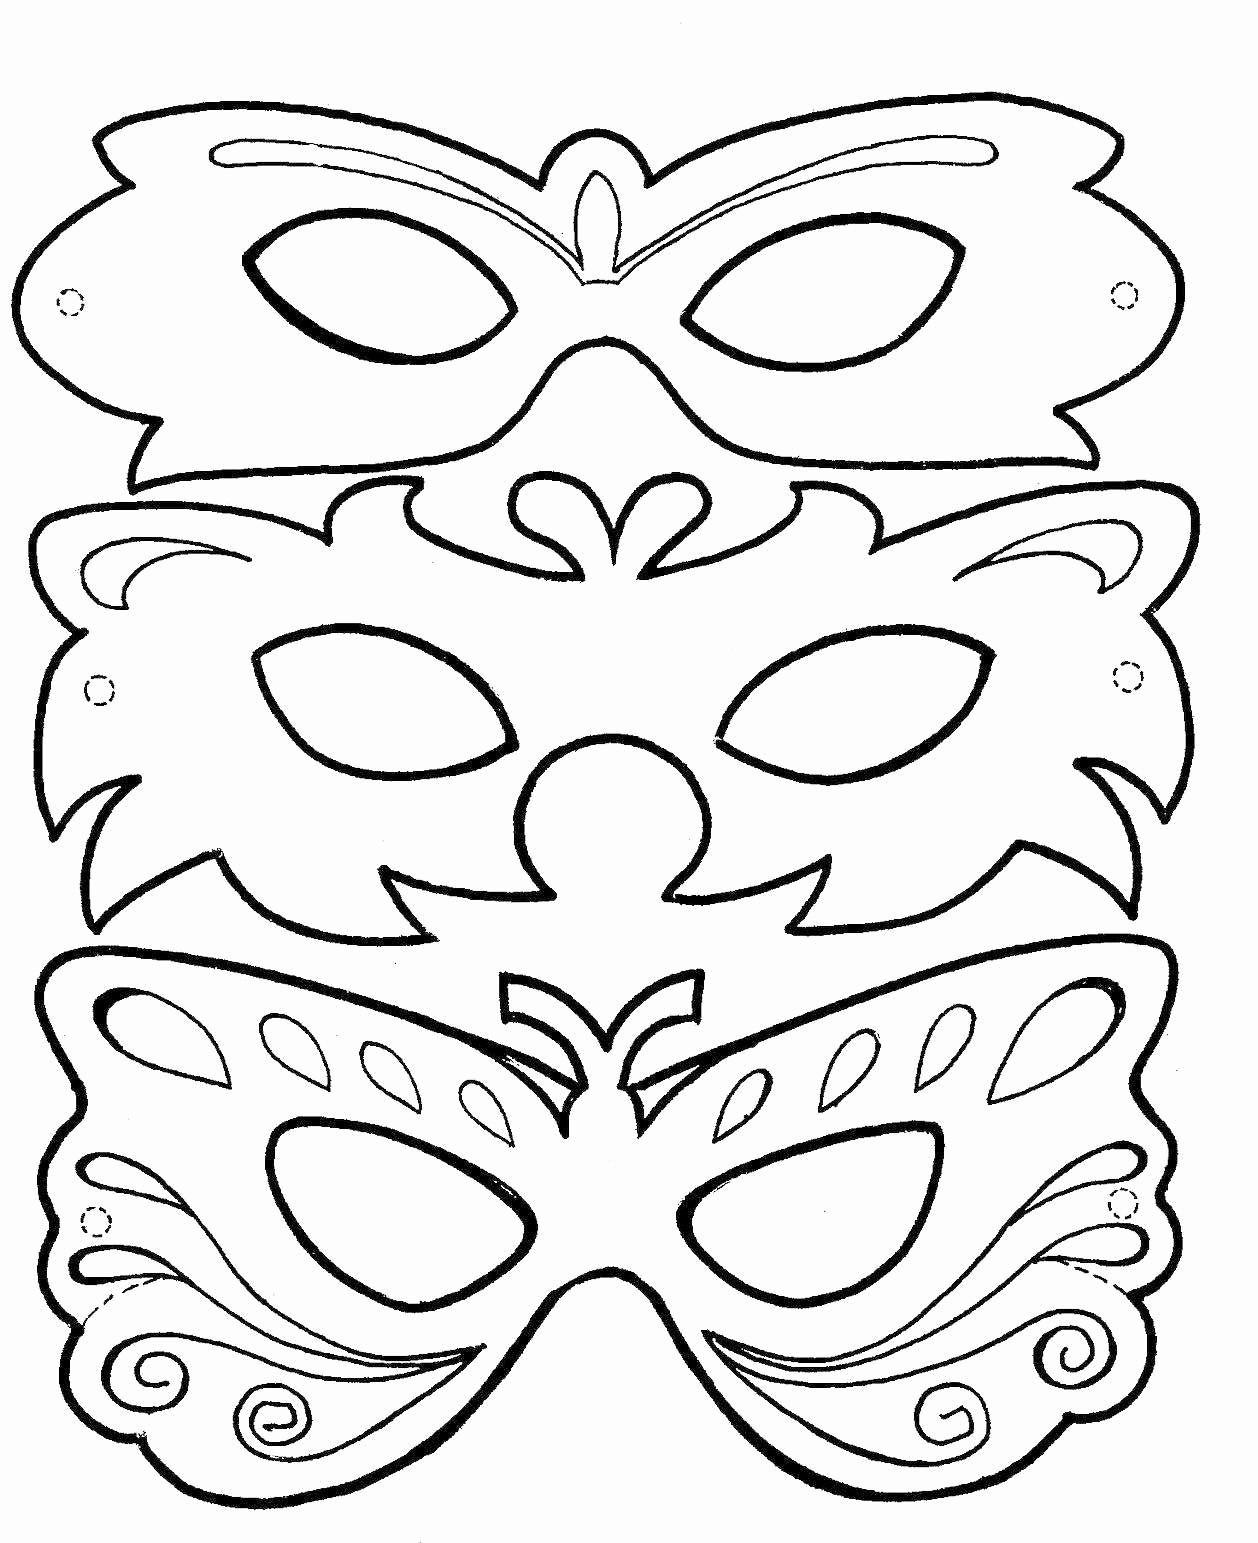 67 Masque Loup Garou | Kiomediworld destiné Masque De Loup À Imprimer